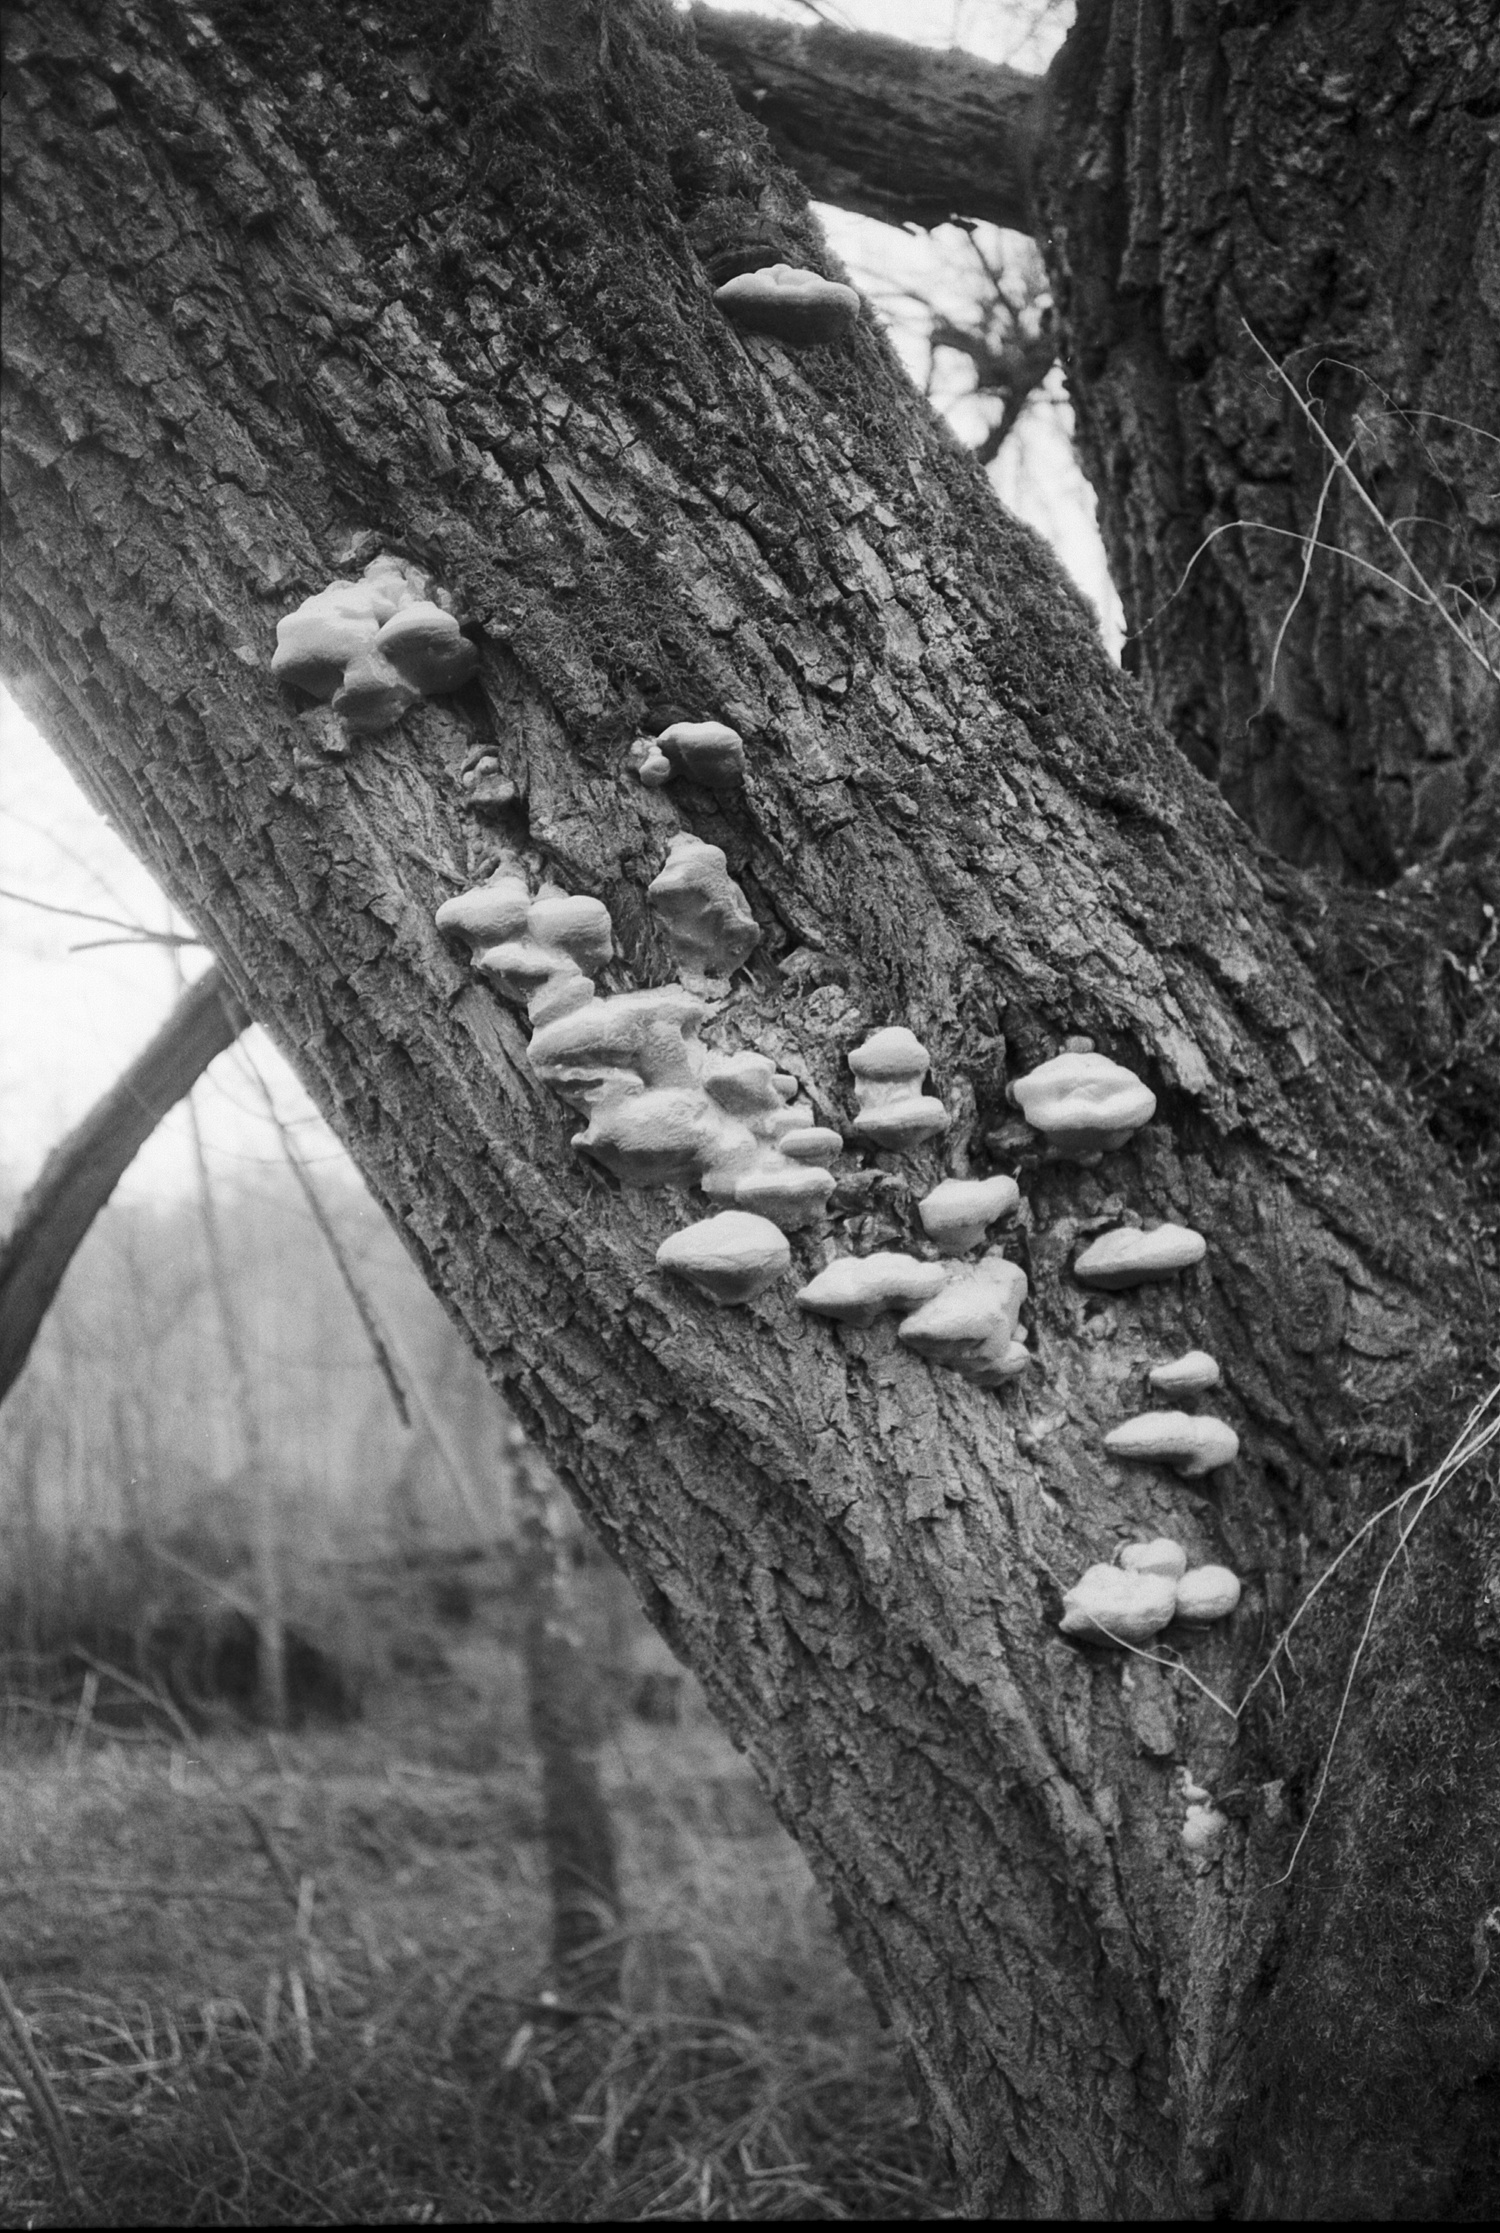 #072 Polypores on the tree, Graz